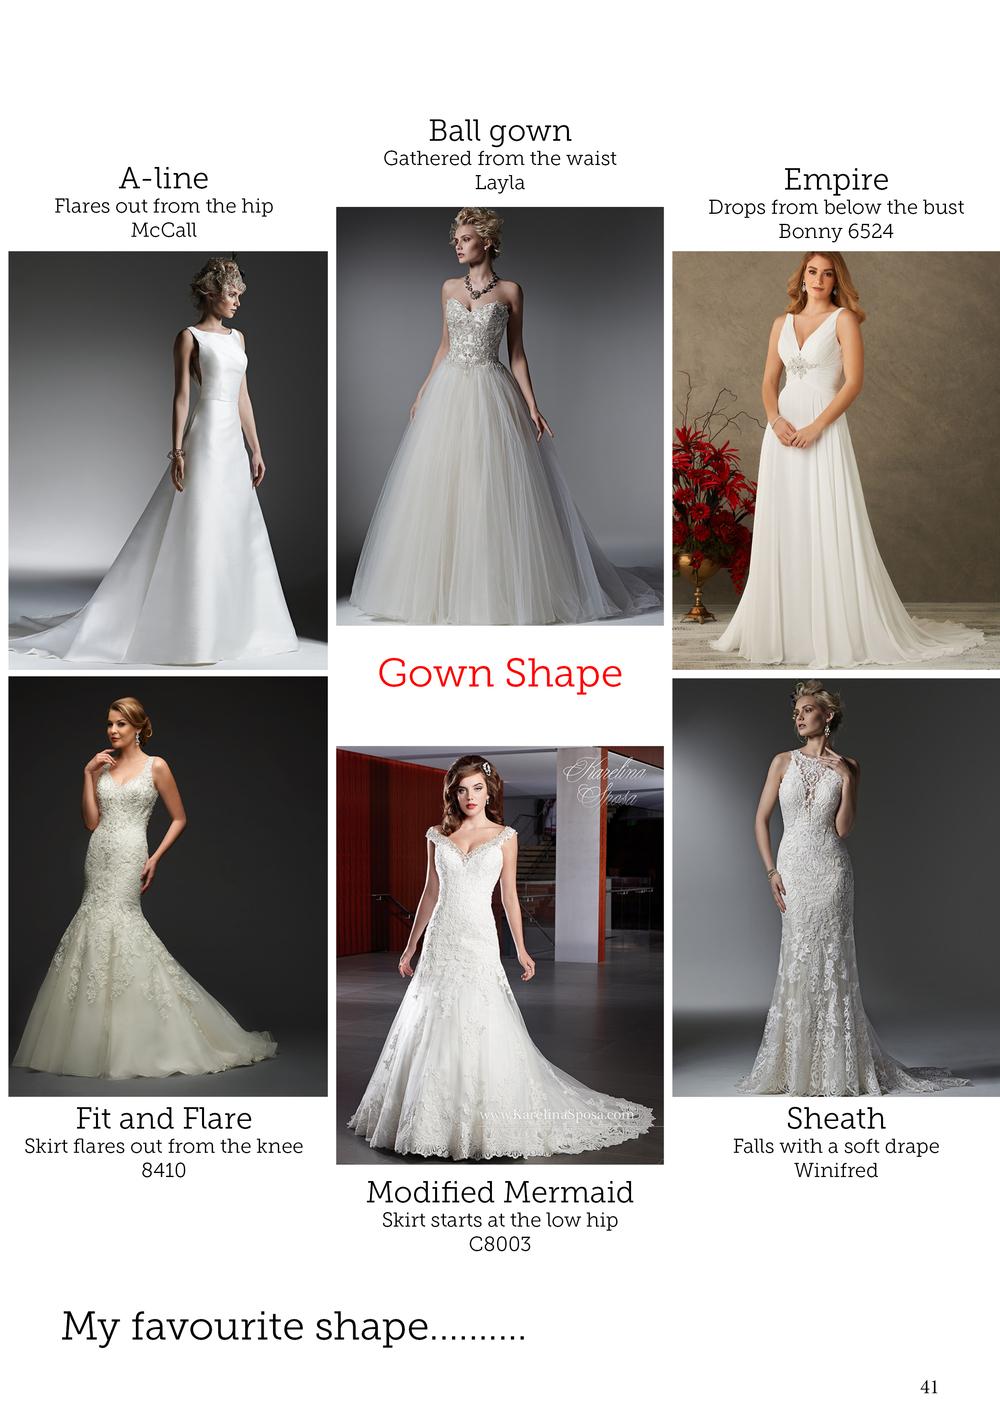 Wedding dress styles and shapes | Bridal advice brought to you by Astra Bridal | www.borrowedandblue.kiwi